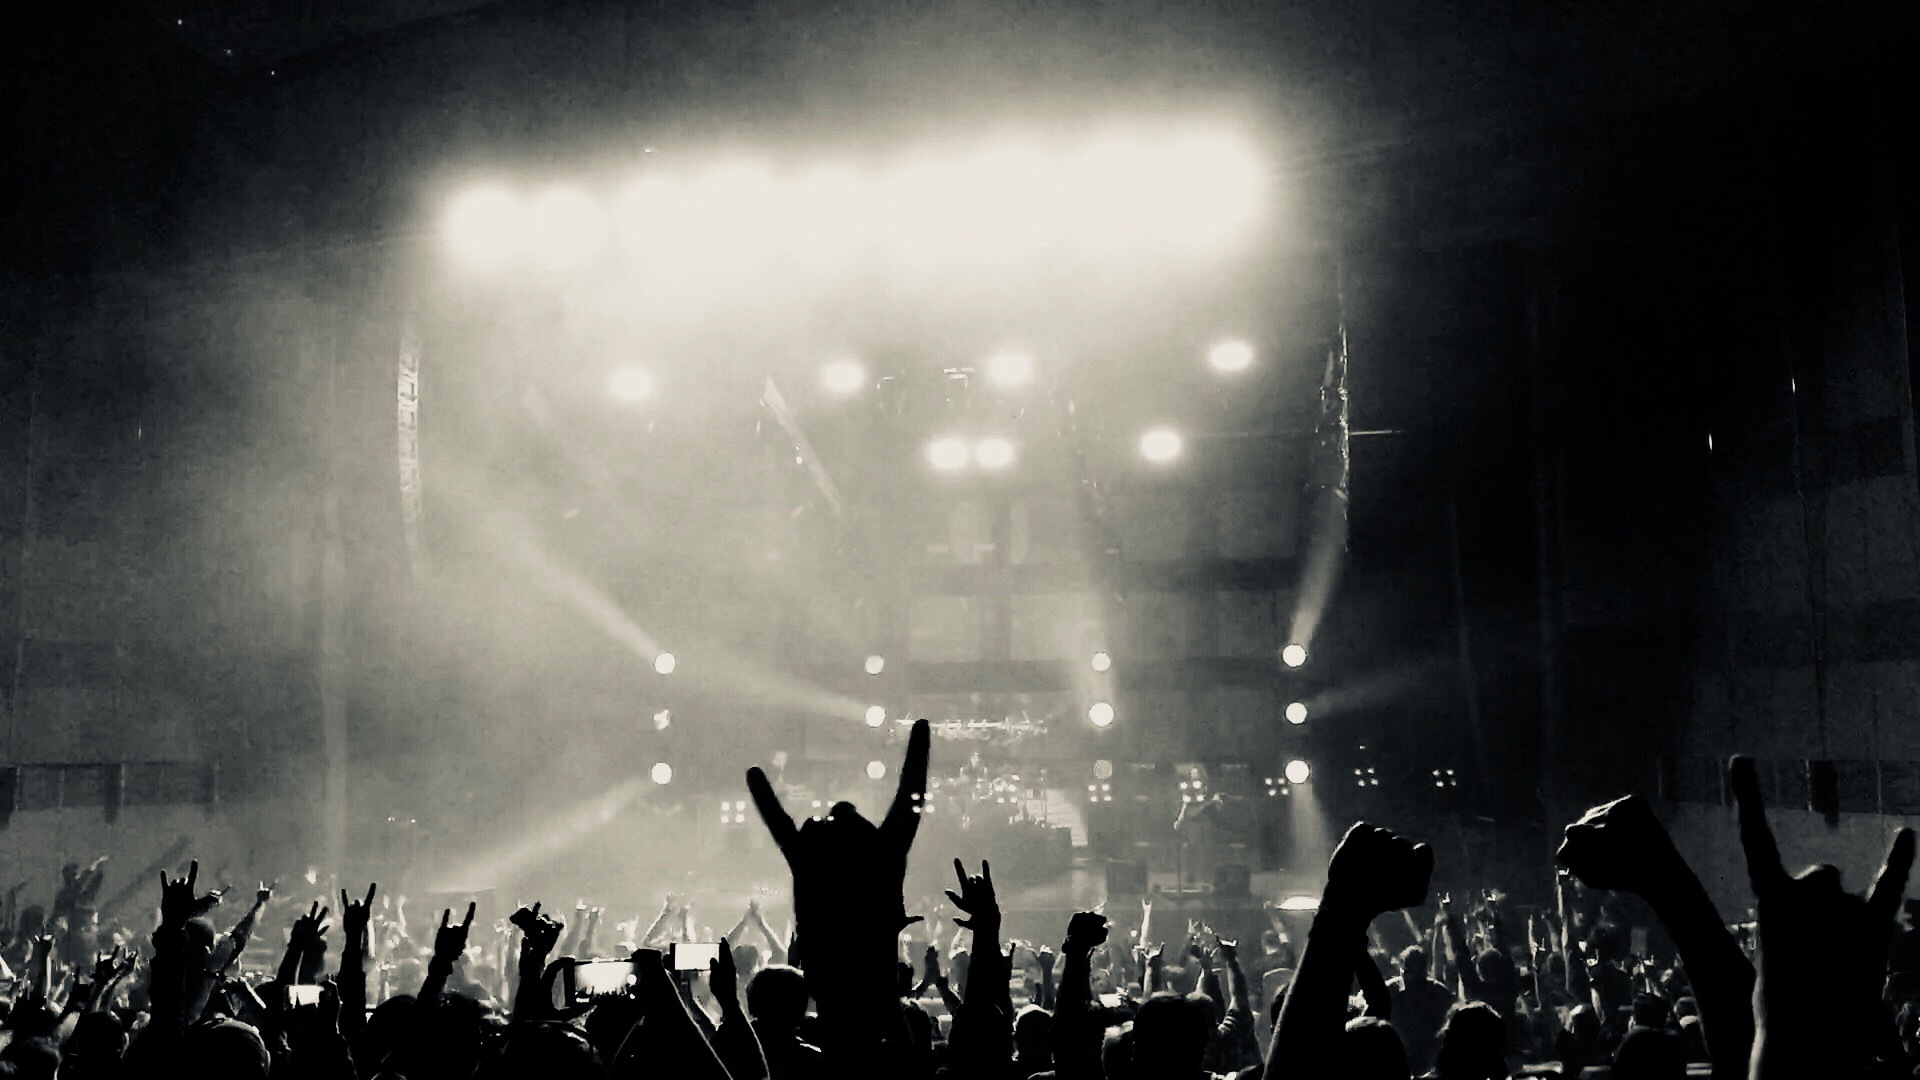 show of hands by mohd sopian